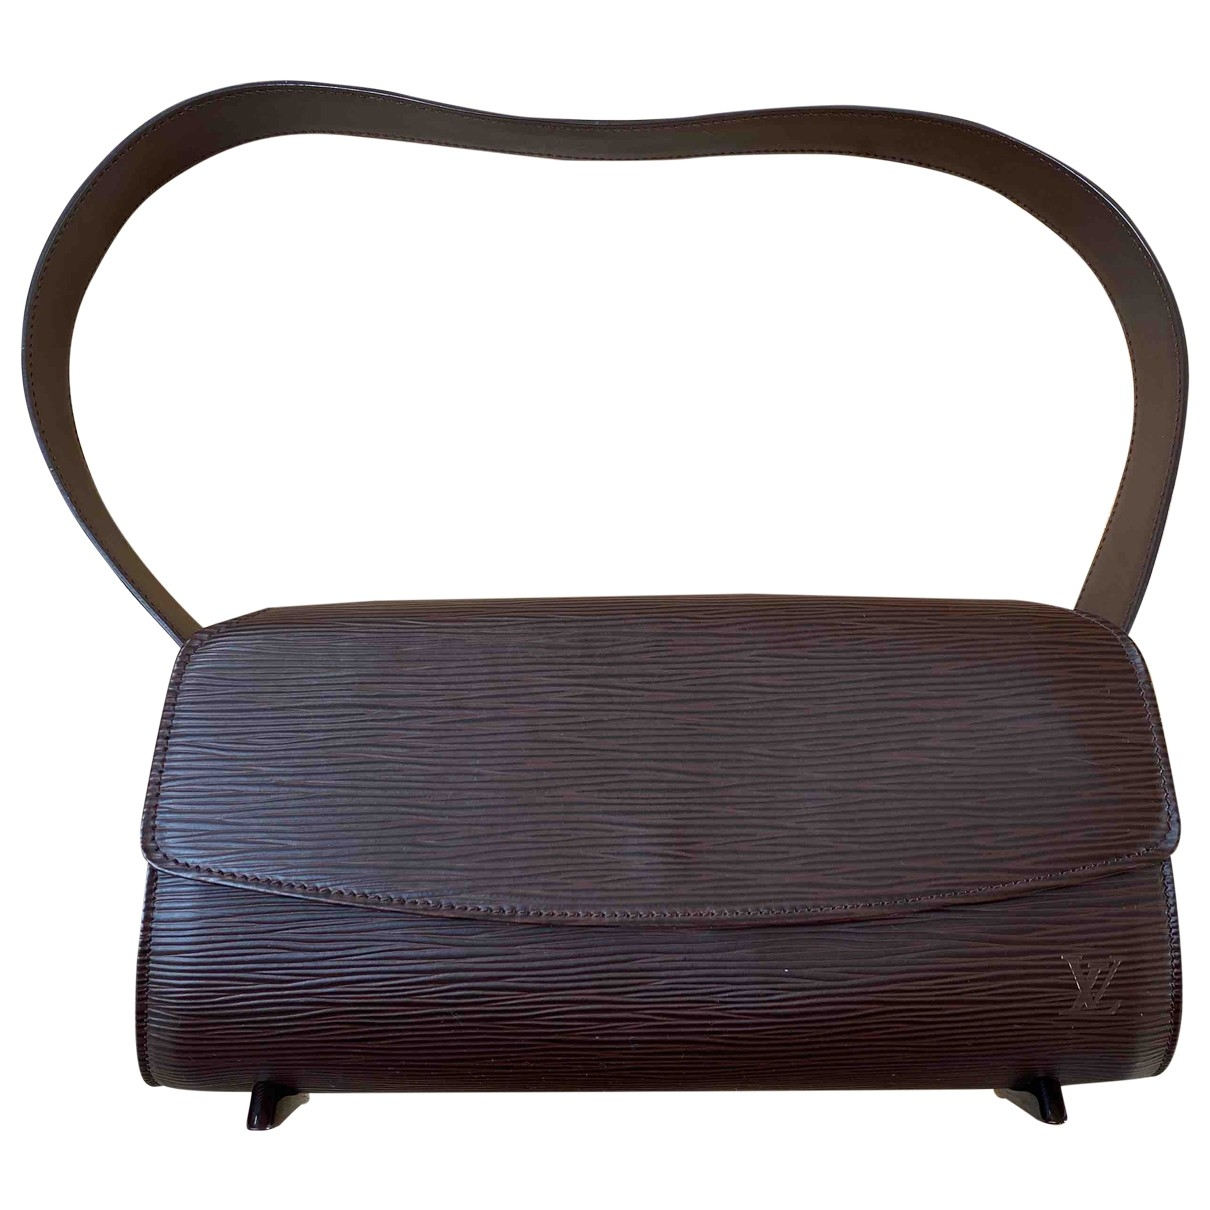 Louis Vuitton Nocturne Brown Leather handbag for Women \N